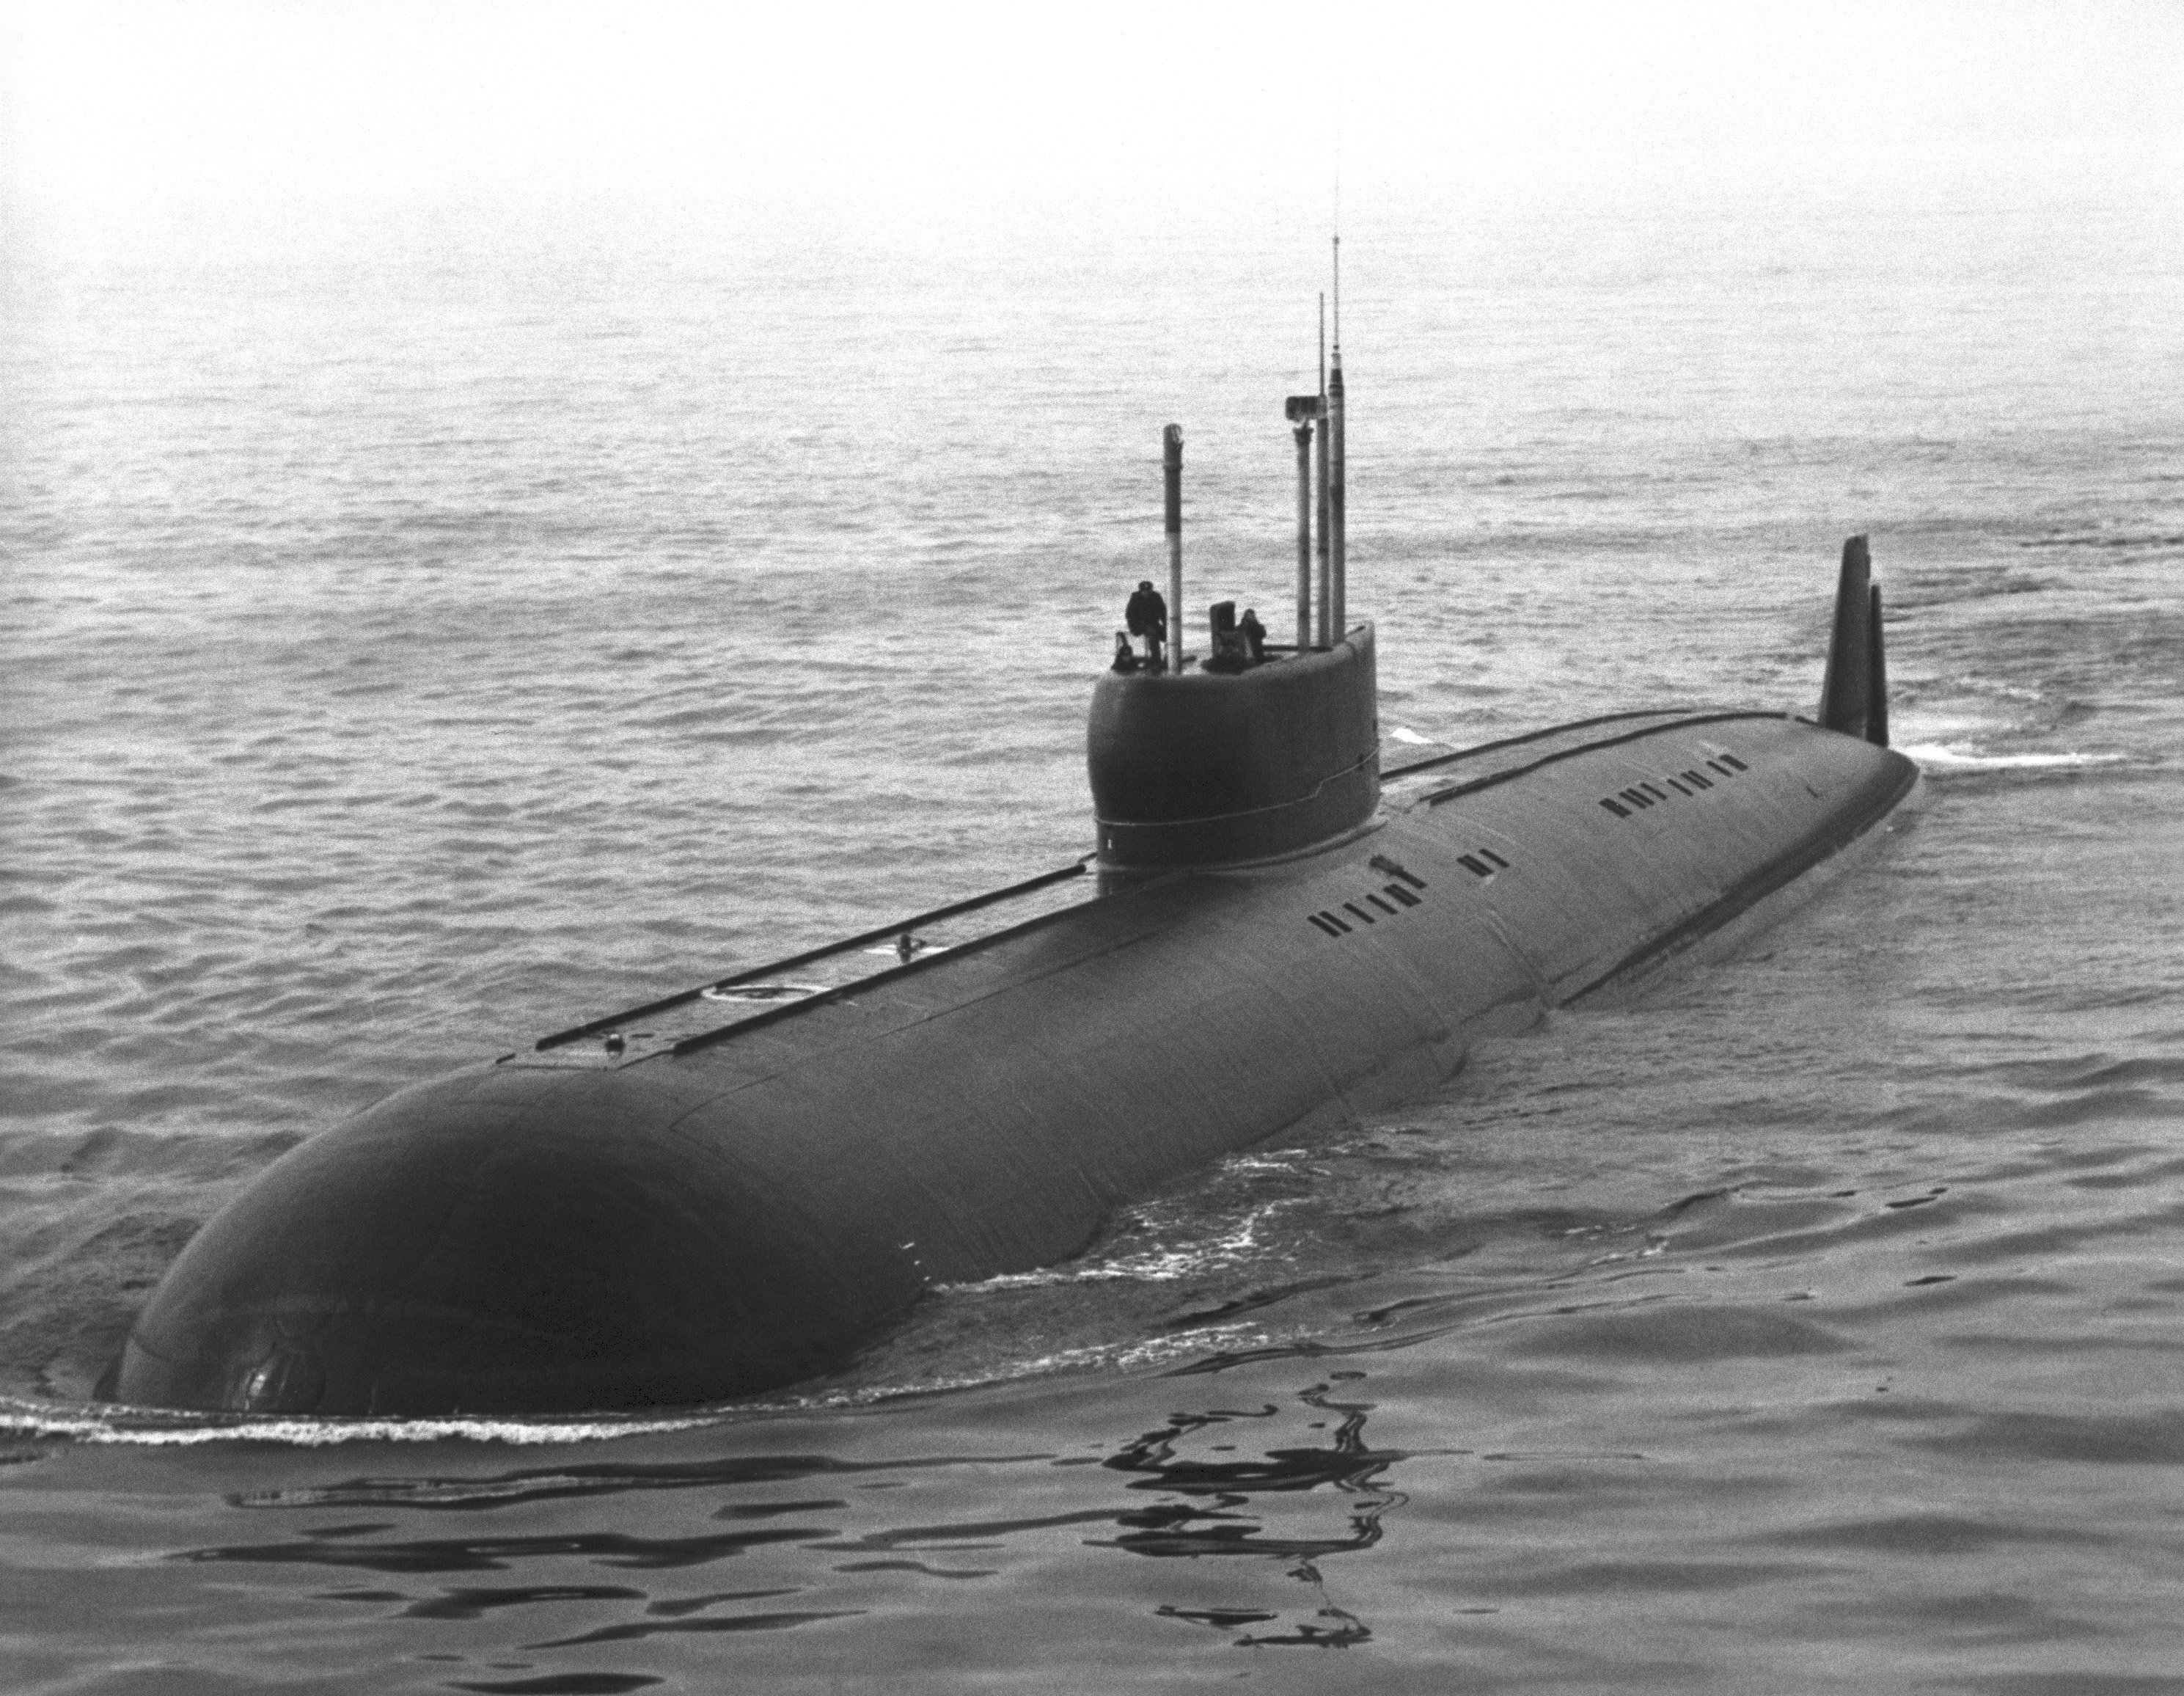 K-162 Antchar du projet 661